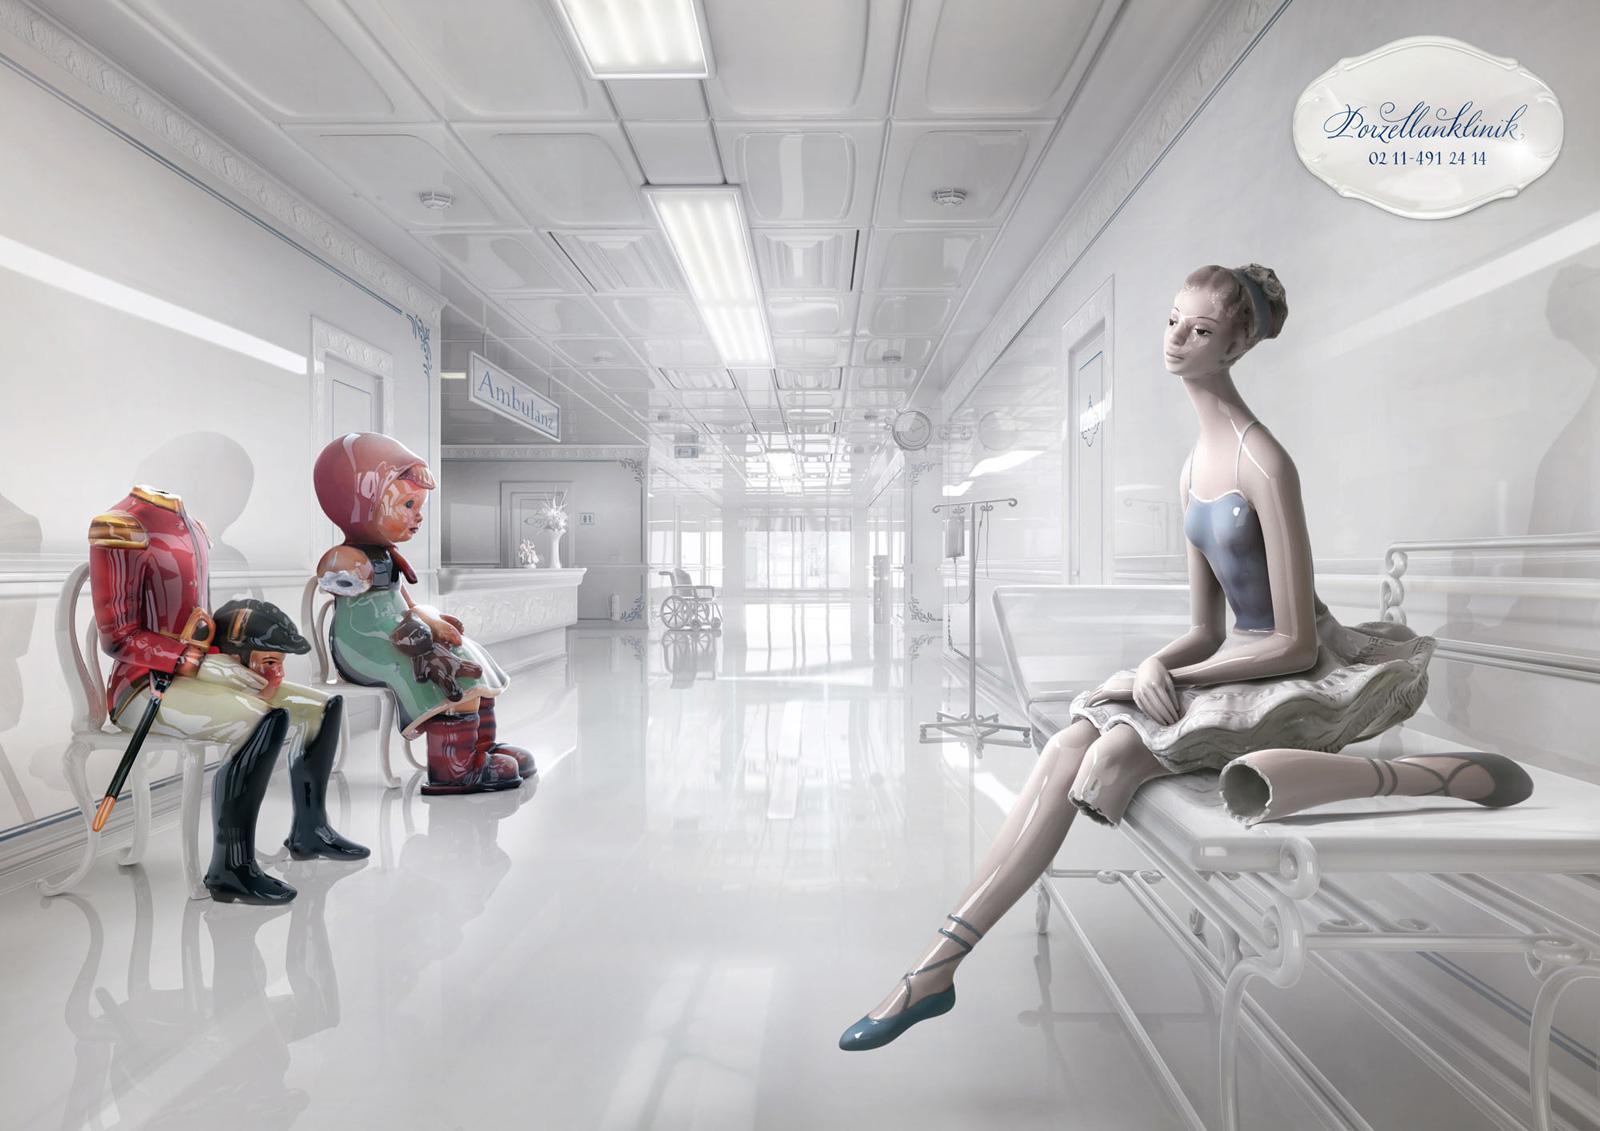 Porzellanklinik Print Ad -  Porcelain Clinic